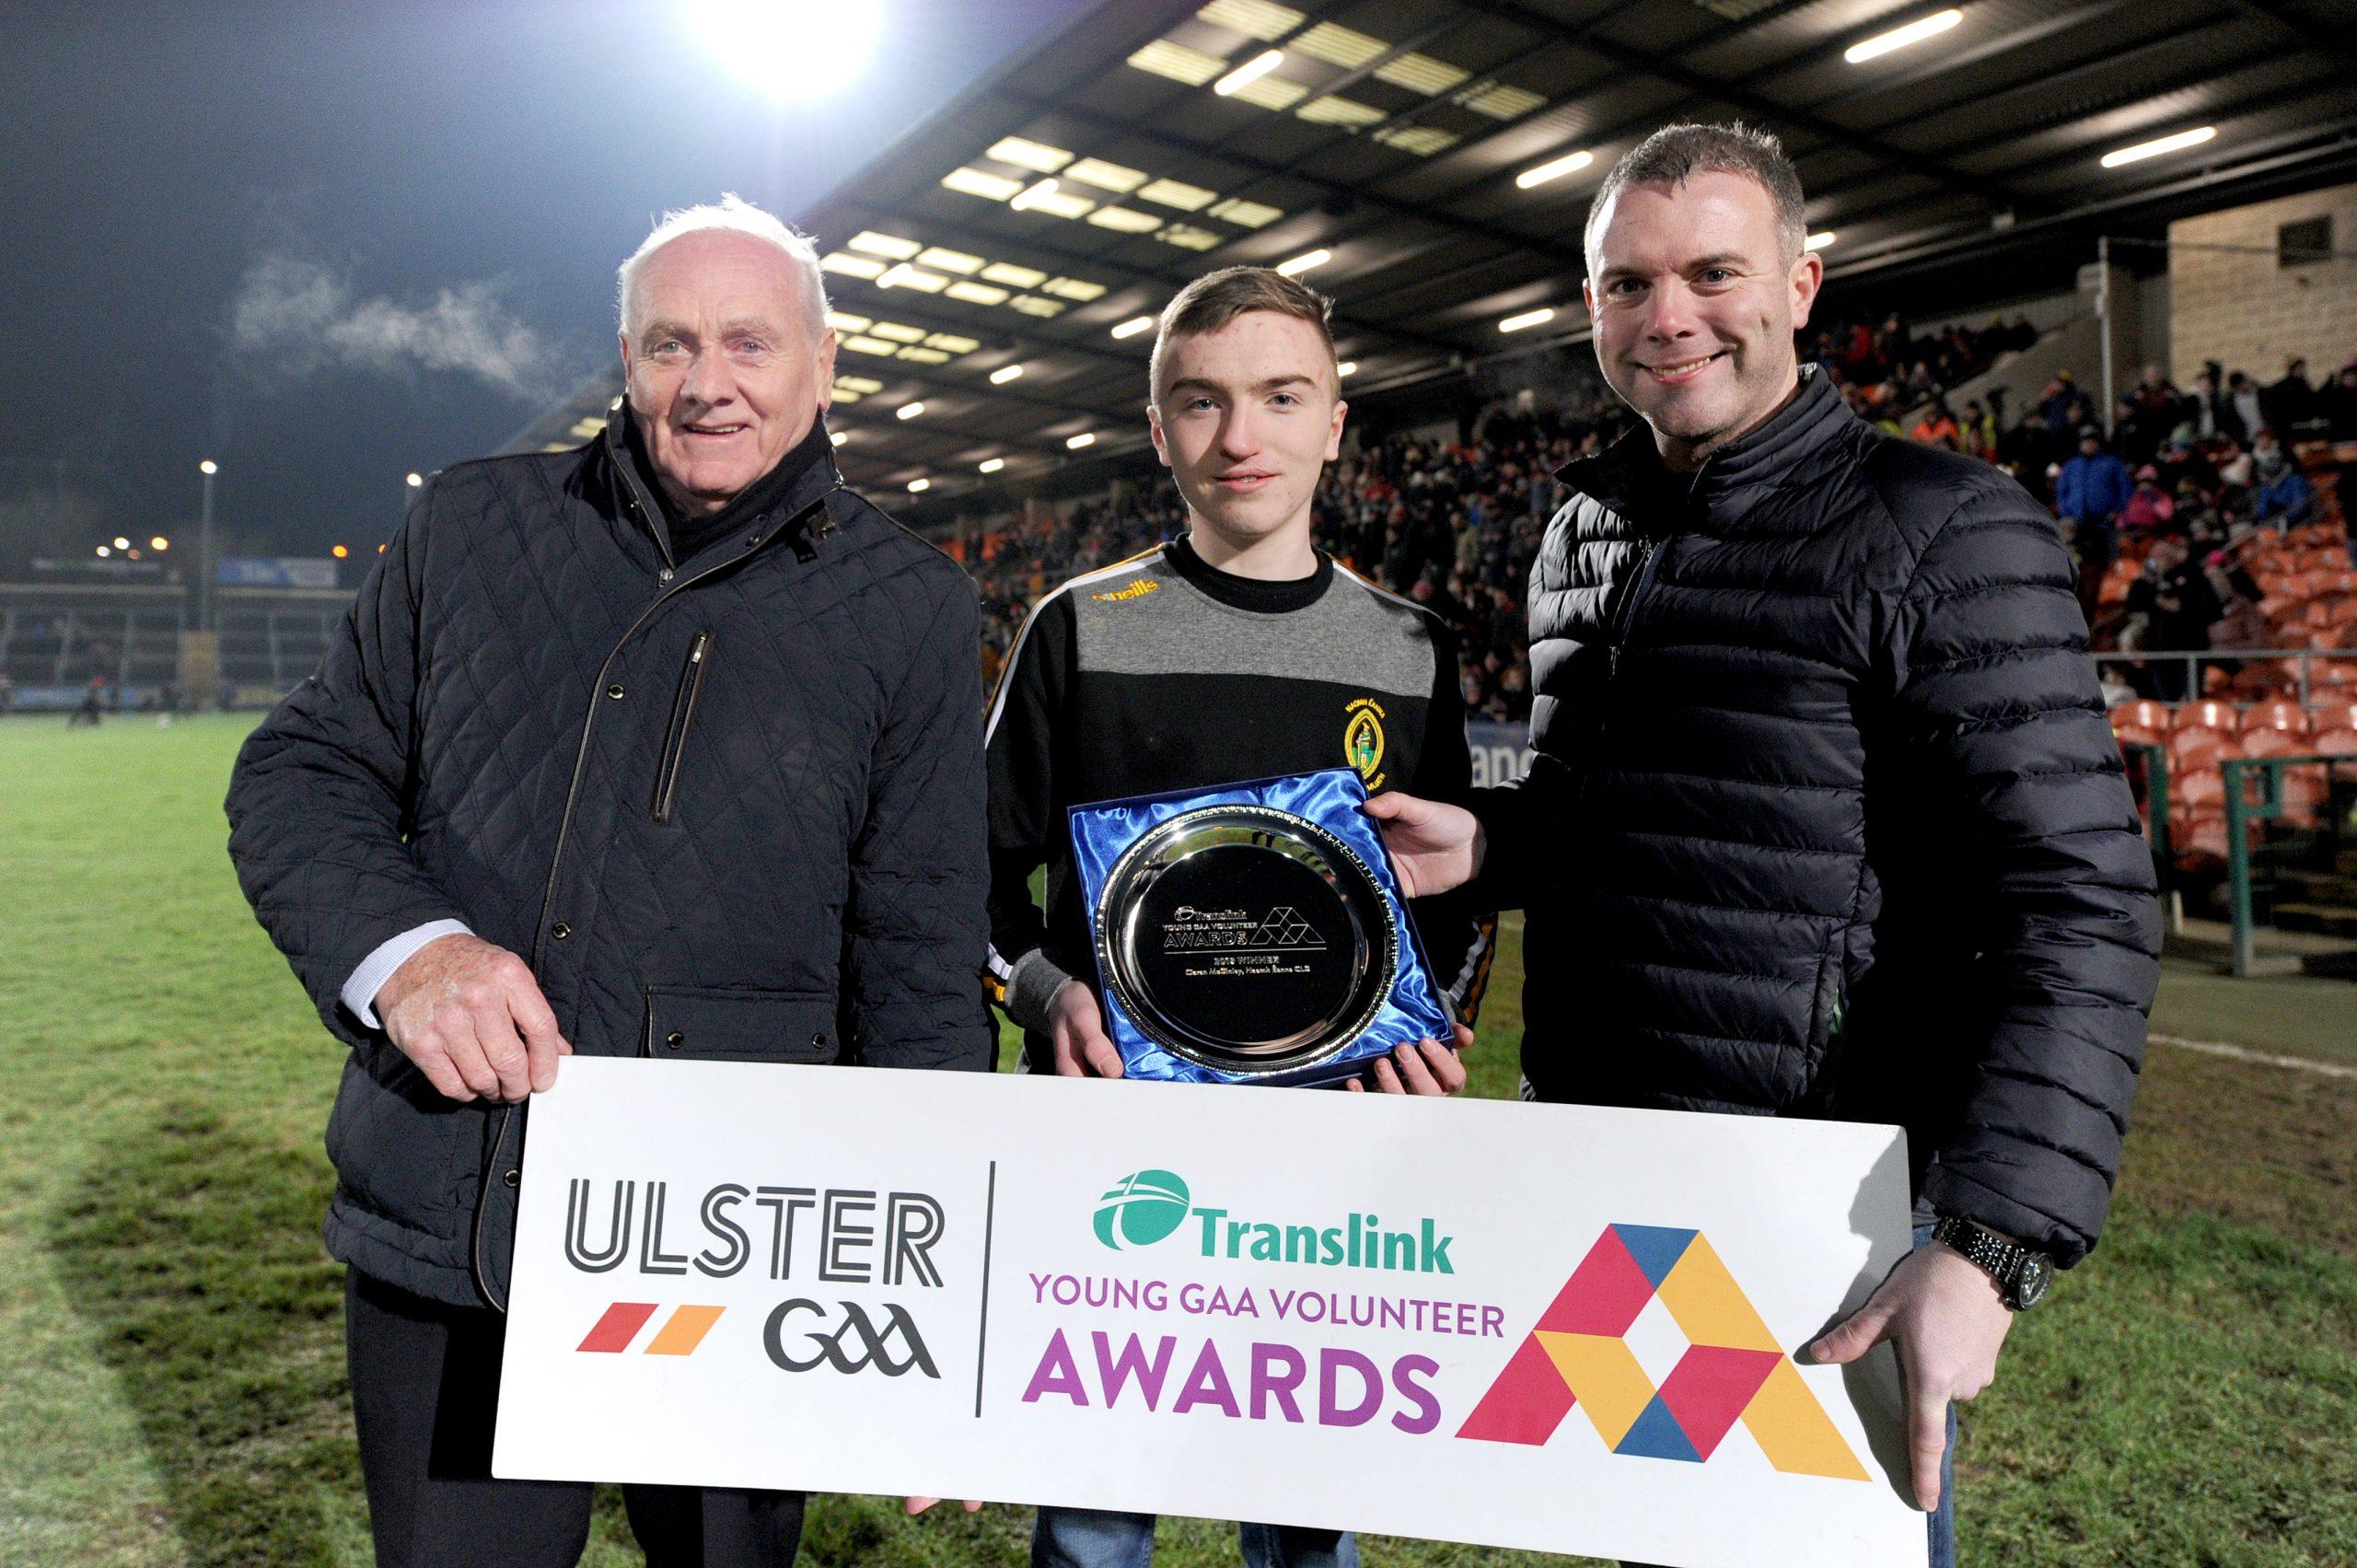 Dedicated Naomh Éanna Player awarded Young GAA Volunteer of Year